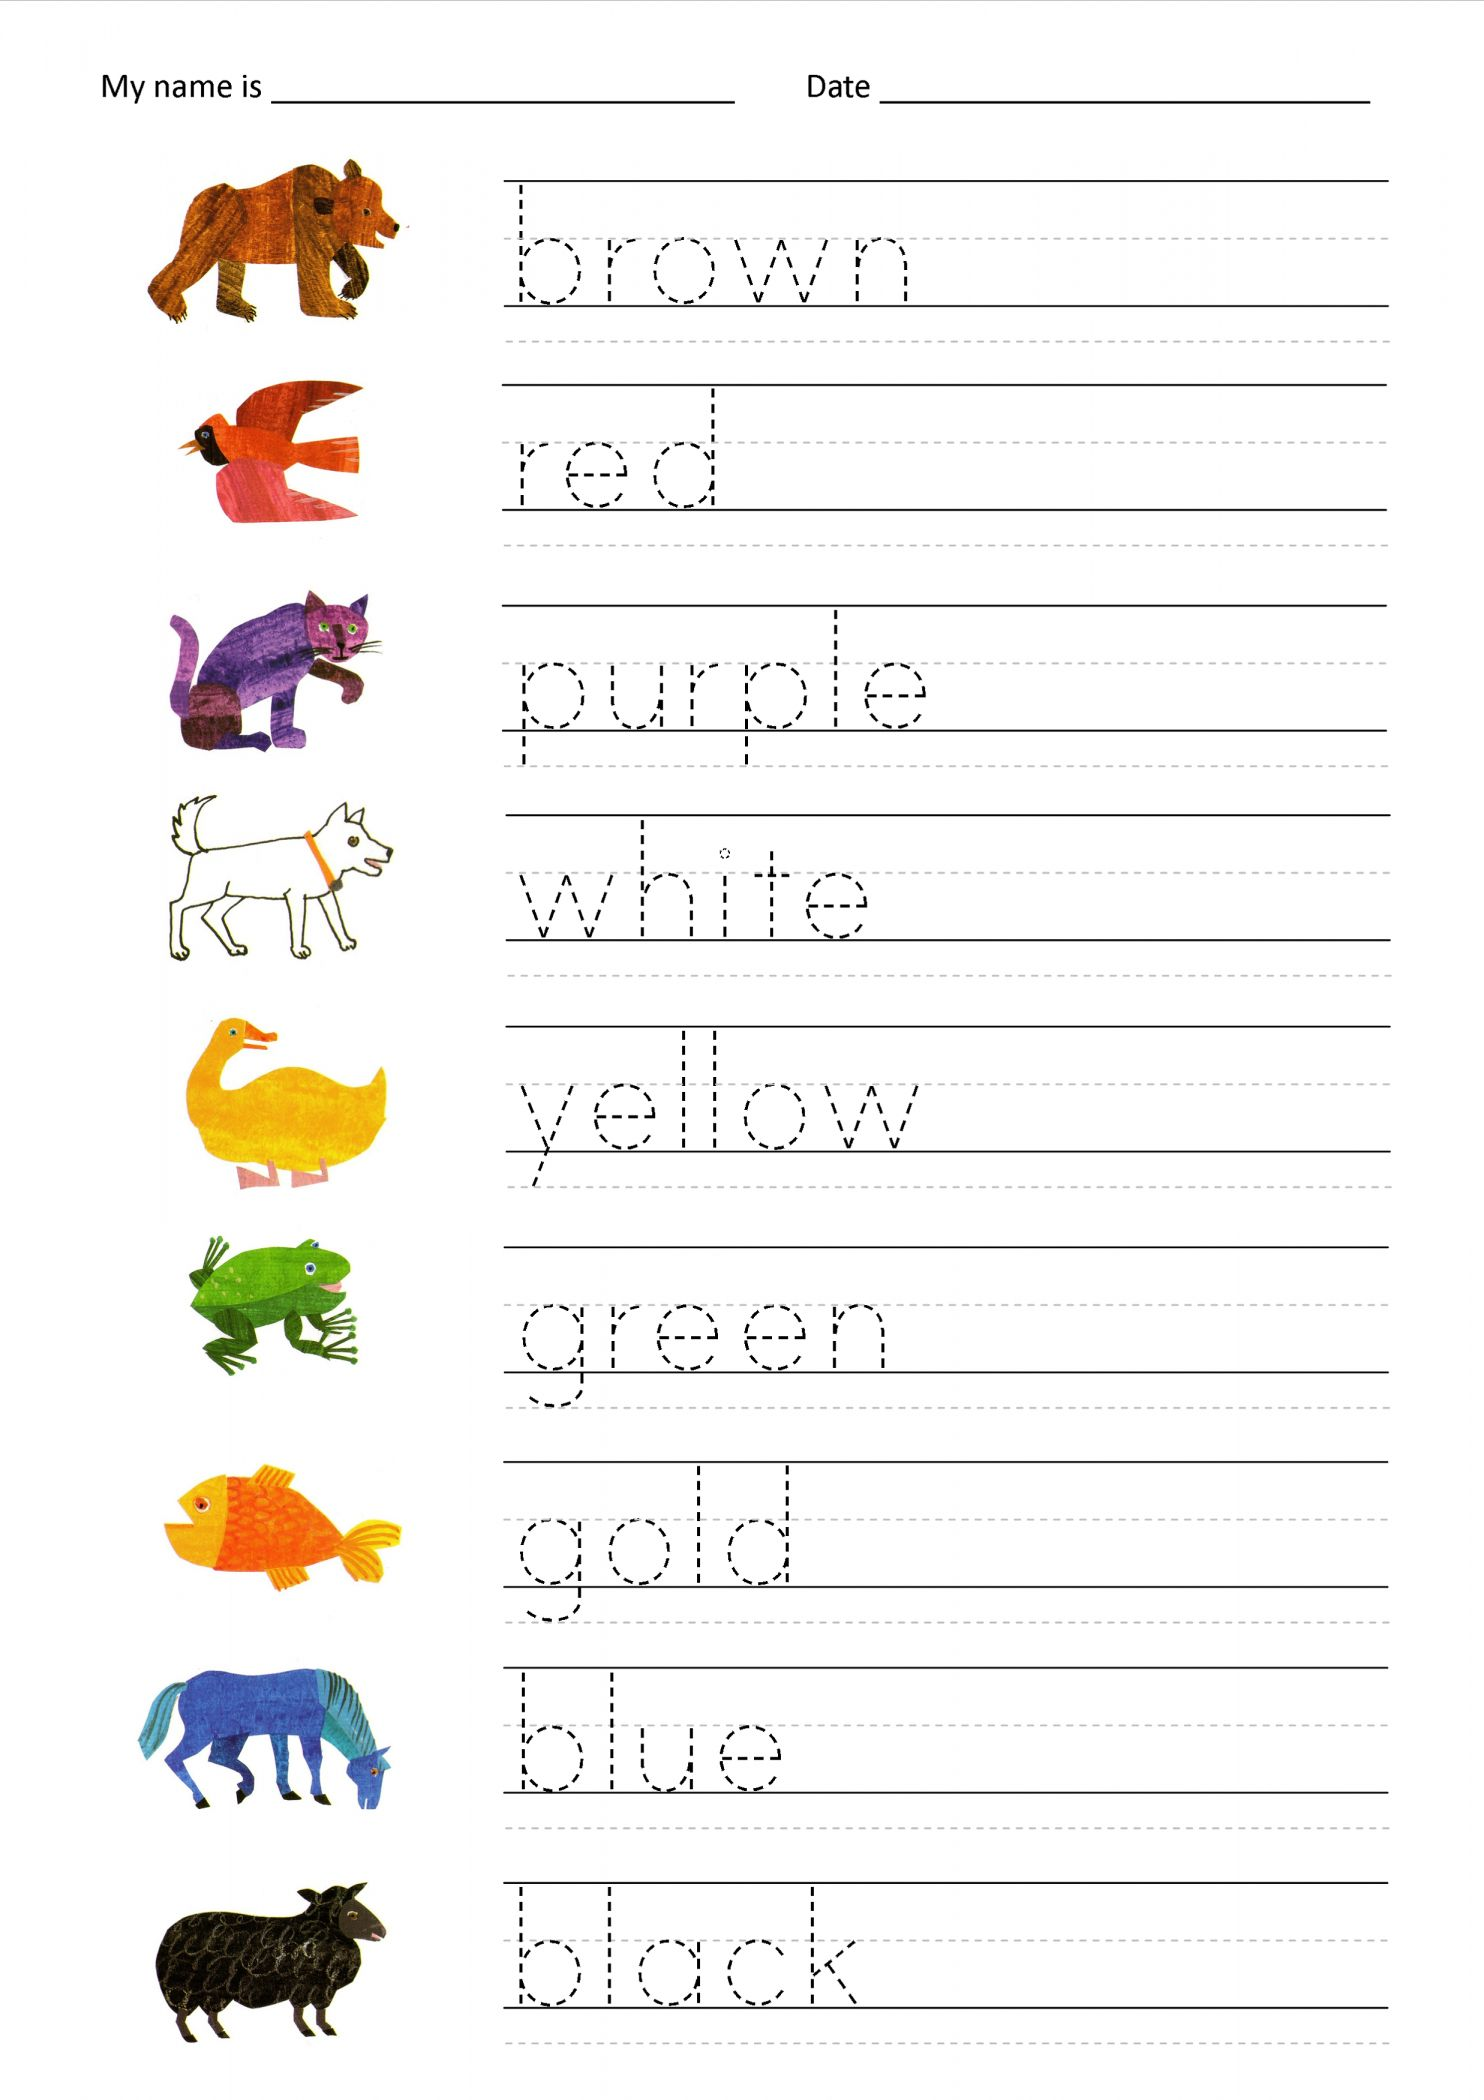 9 Name Worksheet For Kindergarten